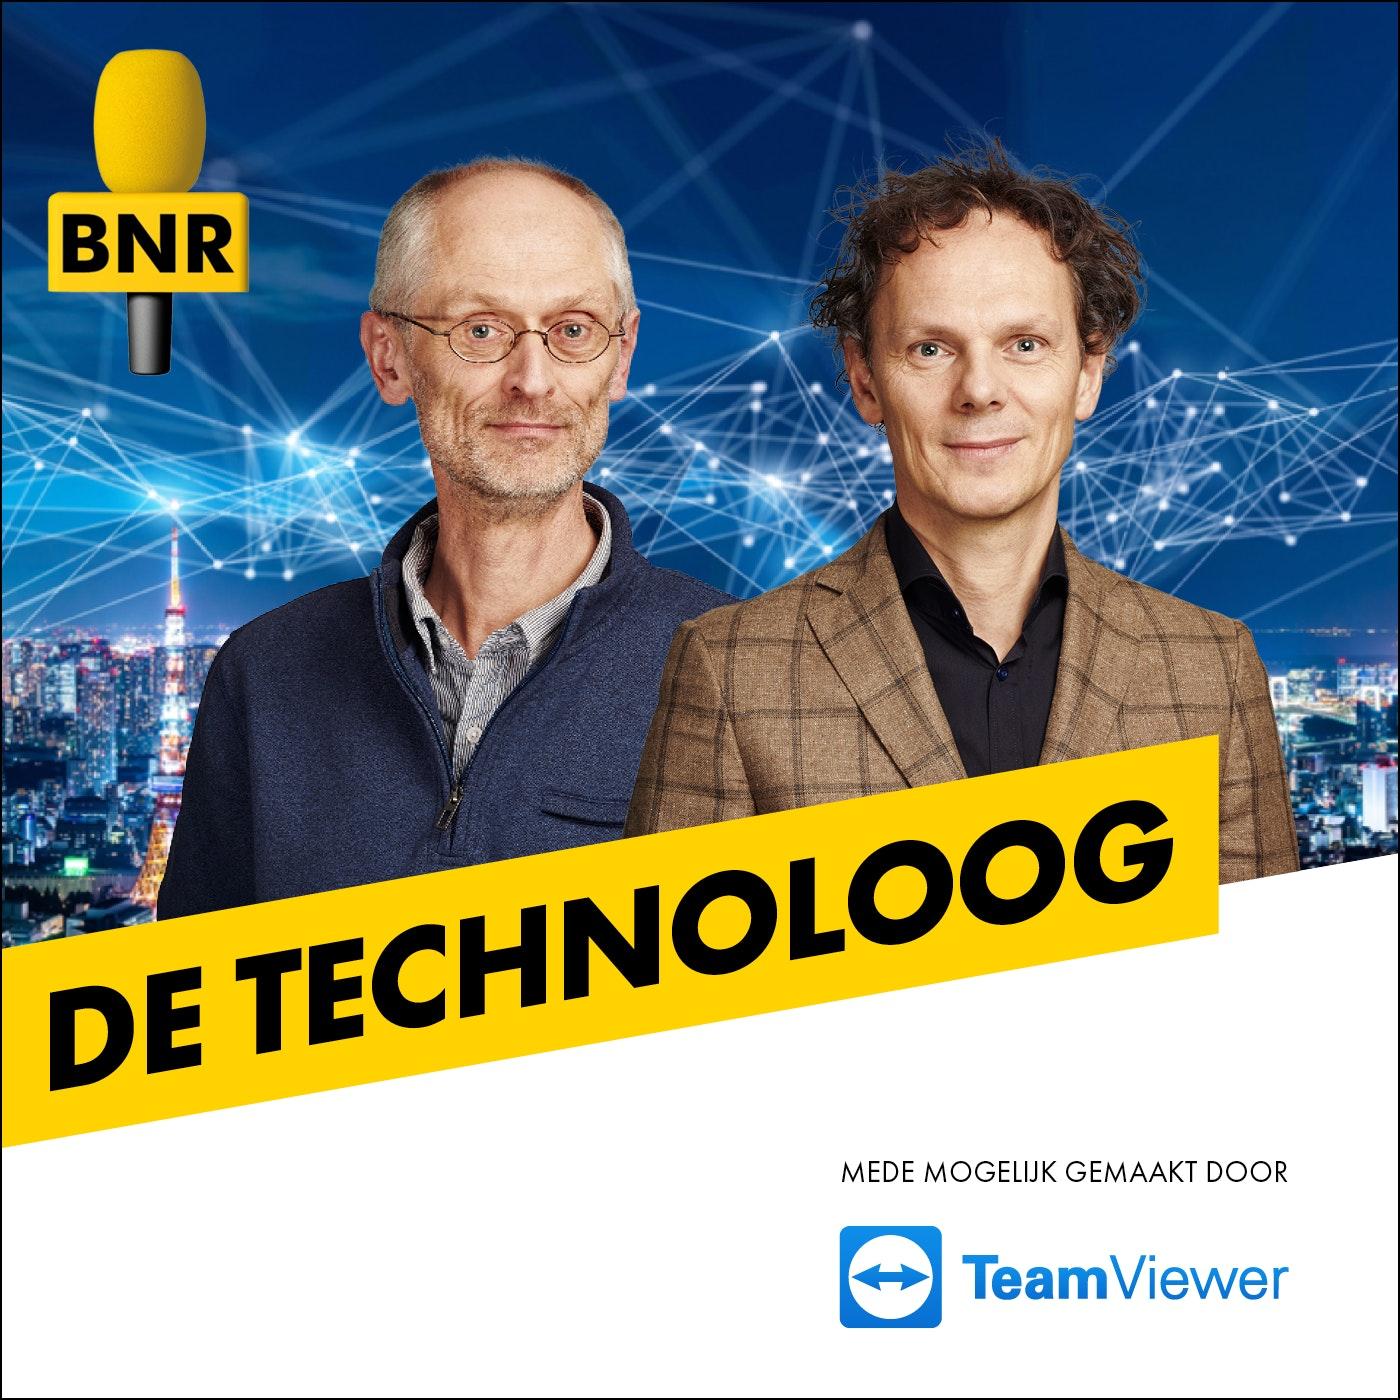 De Technoloog | BNR logo